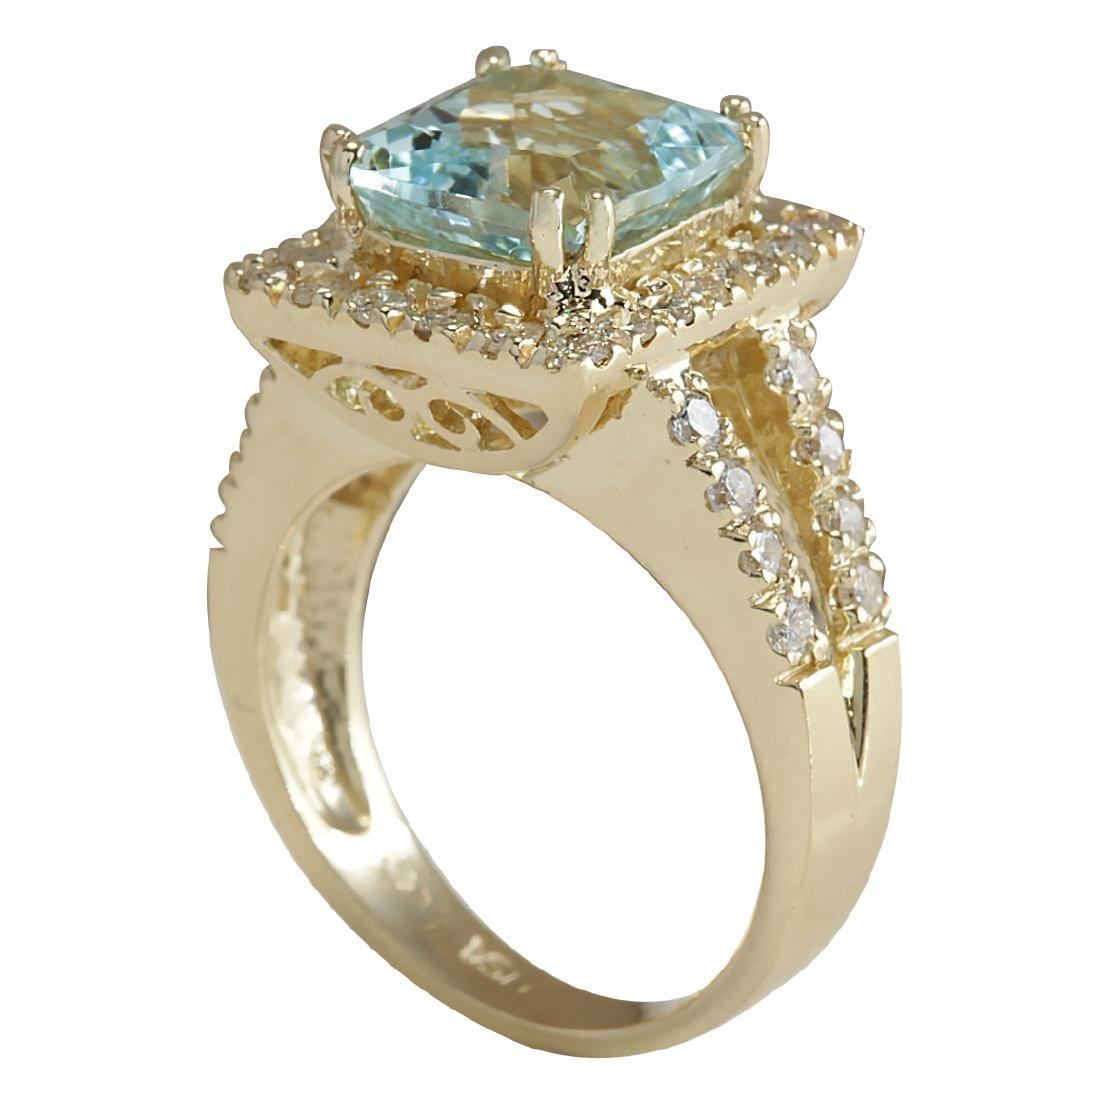 4.13CTW Natural Aquamarine And Diamond Ring In 18K - 3